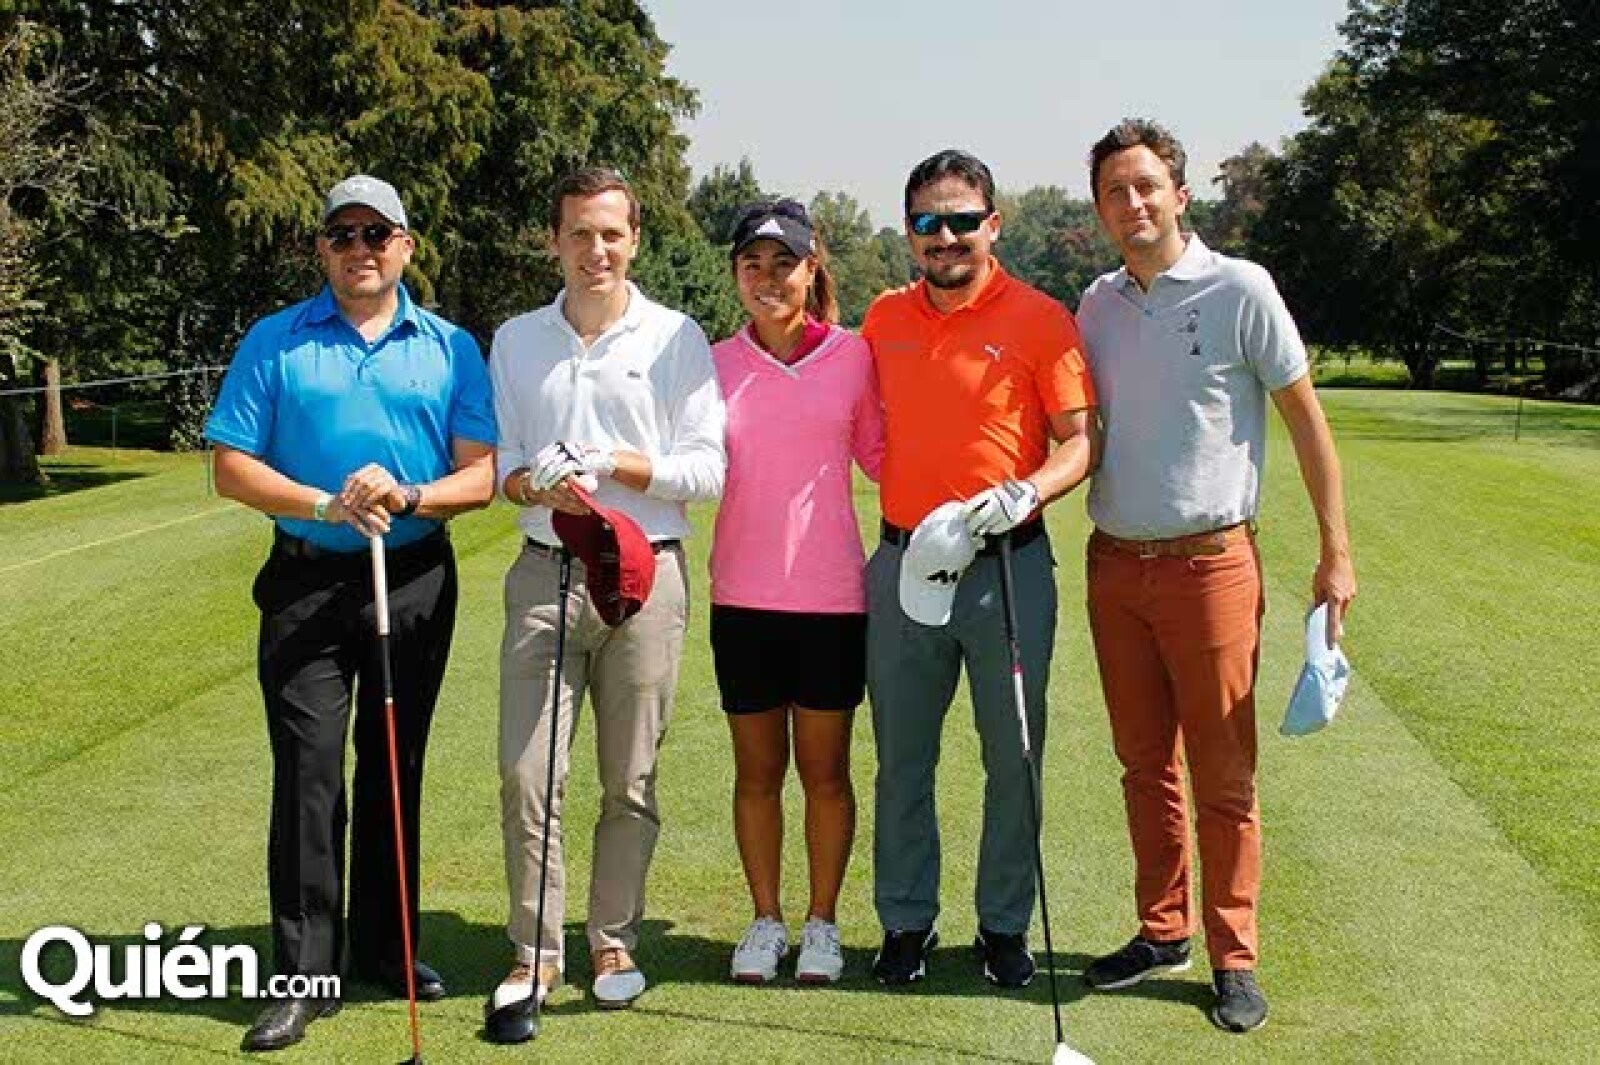 Miguel Monteagudo,Adrian Dultzin,Danielle Kang,Javier Salinas y Diego Dultzin